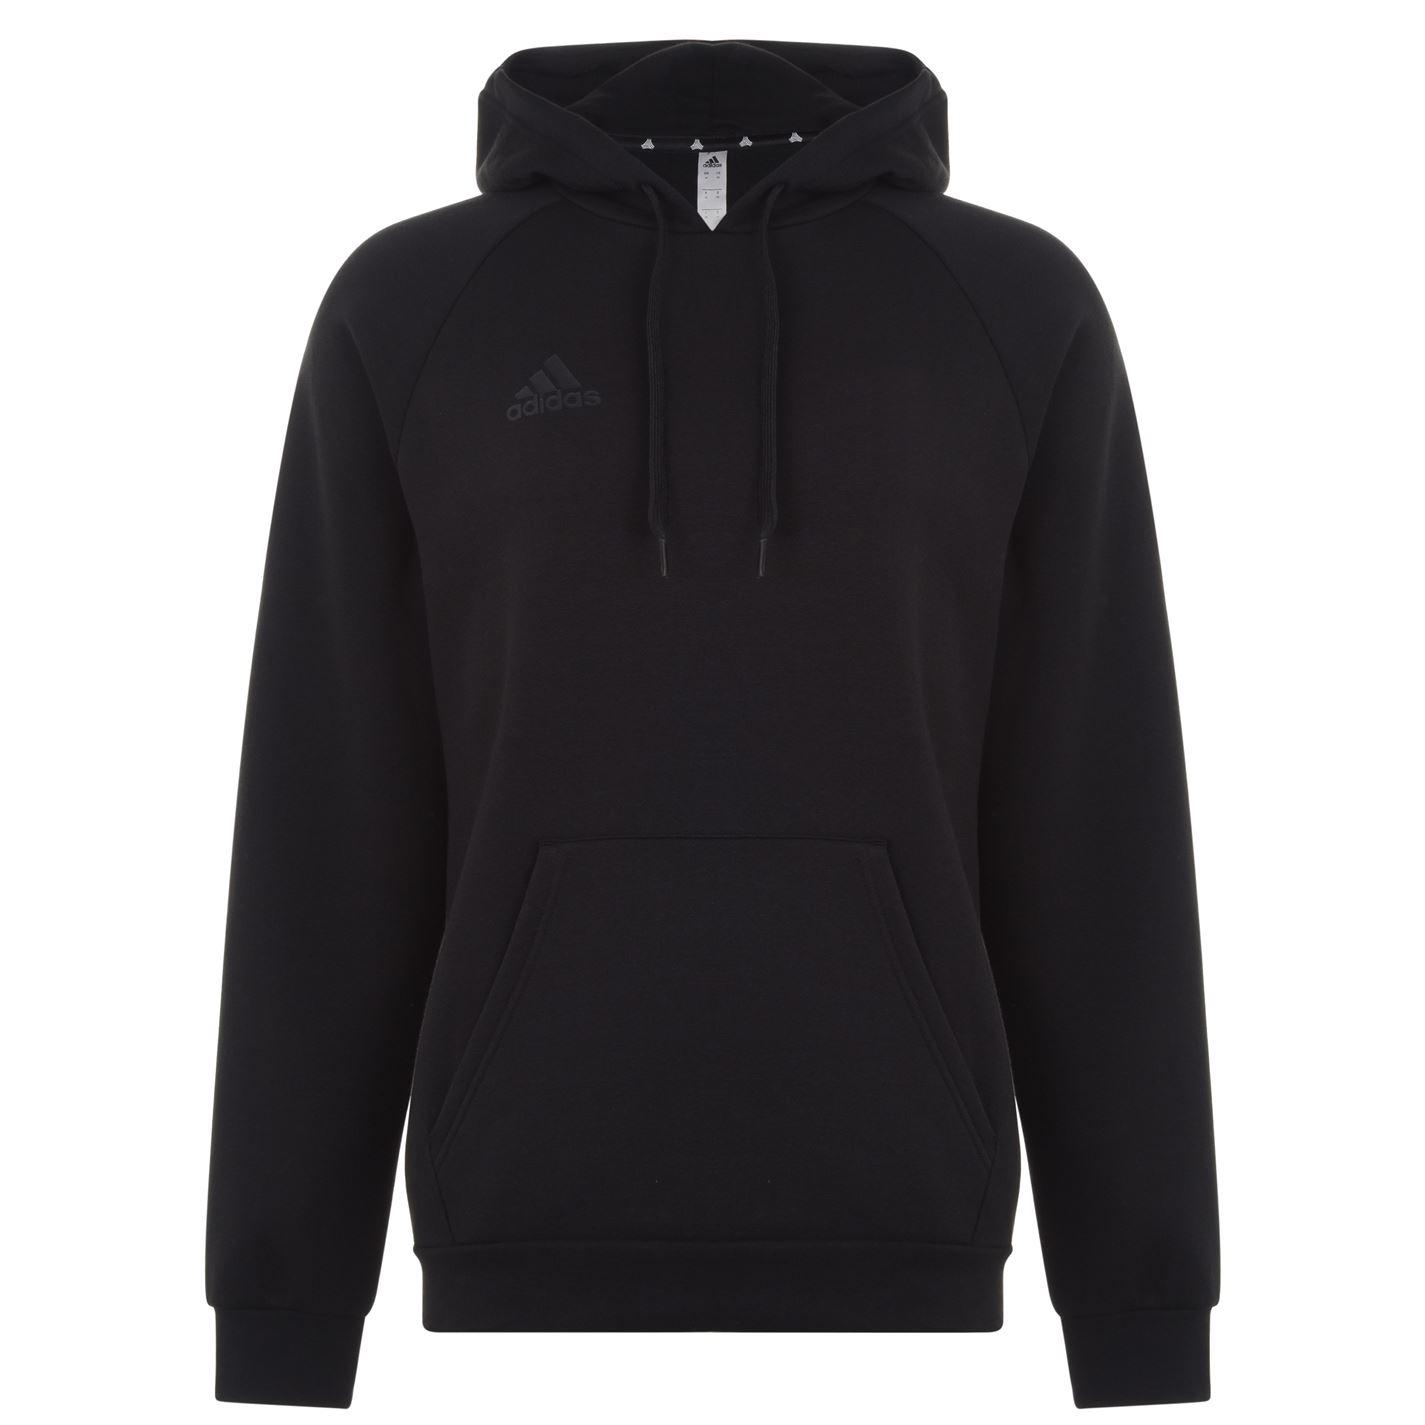 Adidas Tango Hood Sn01